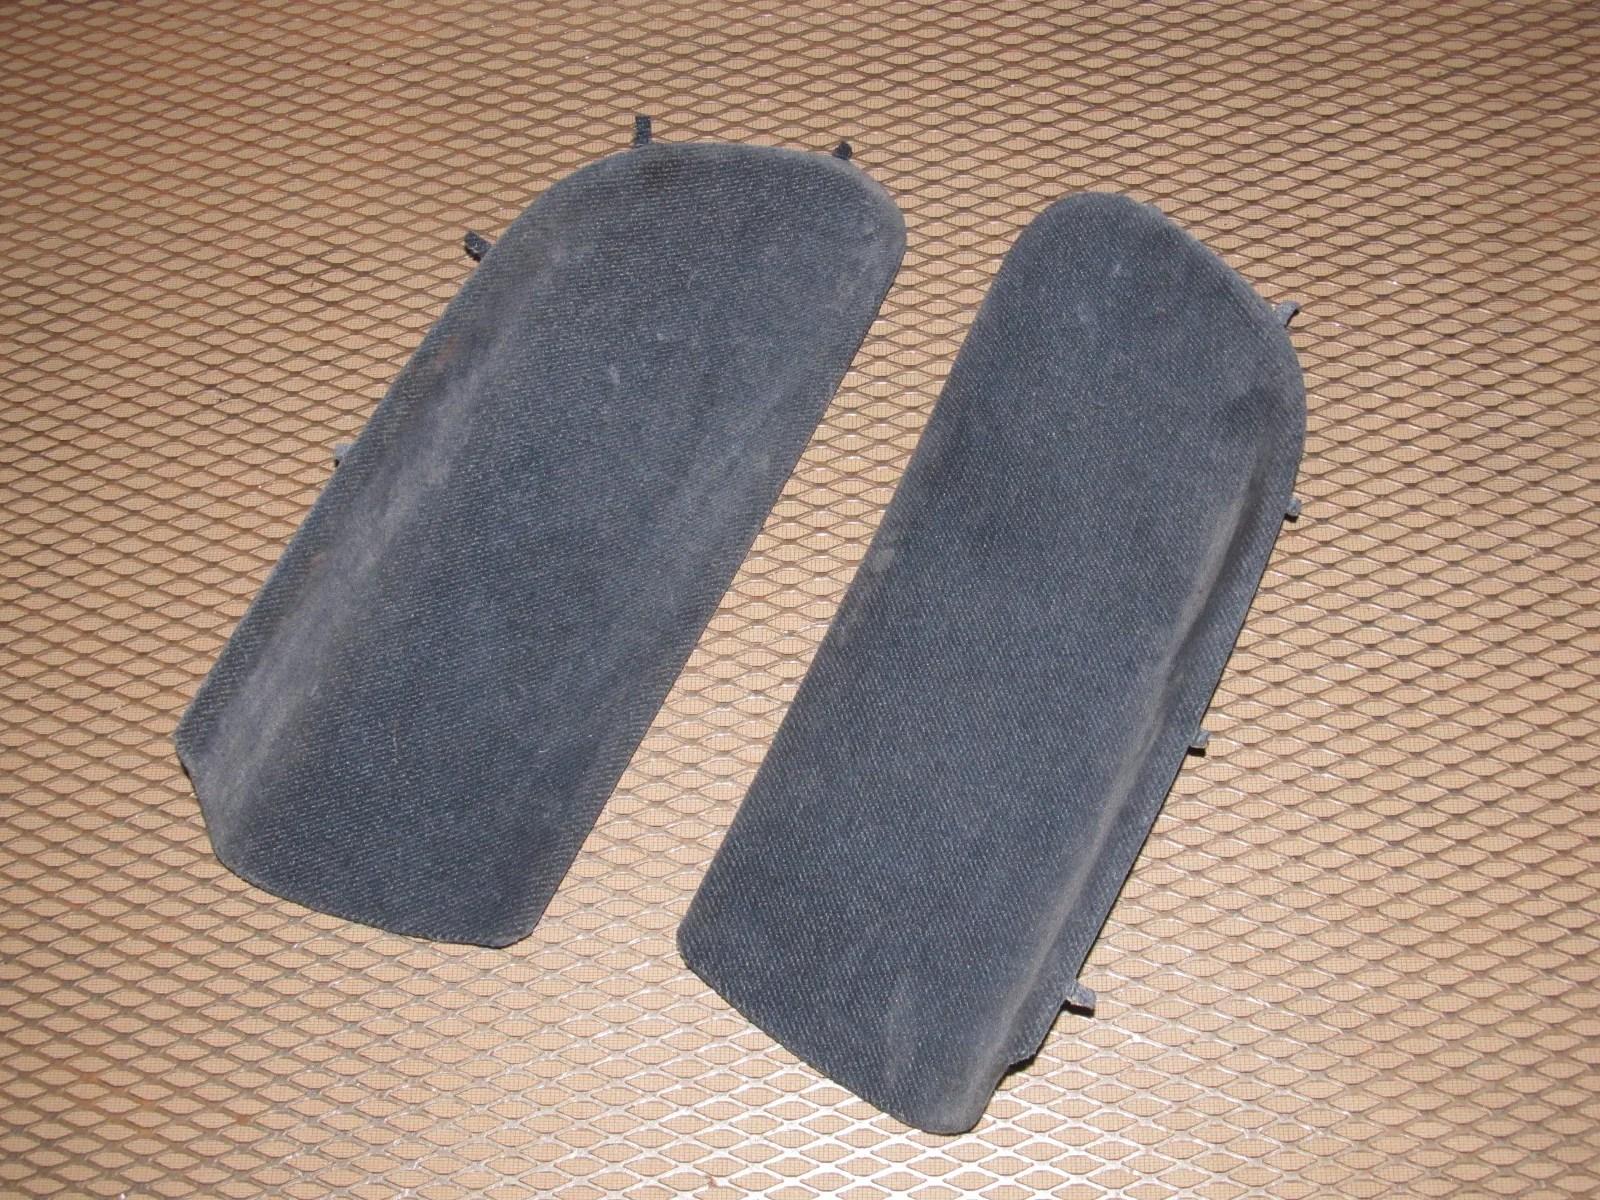 92 96 honda prelude oem interior rear quarter panel insert cloth cover  [ 1600 x 1200 Pixel ]